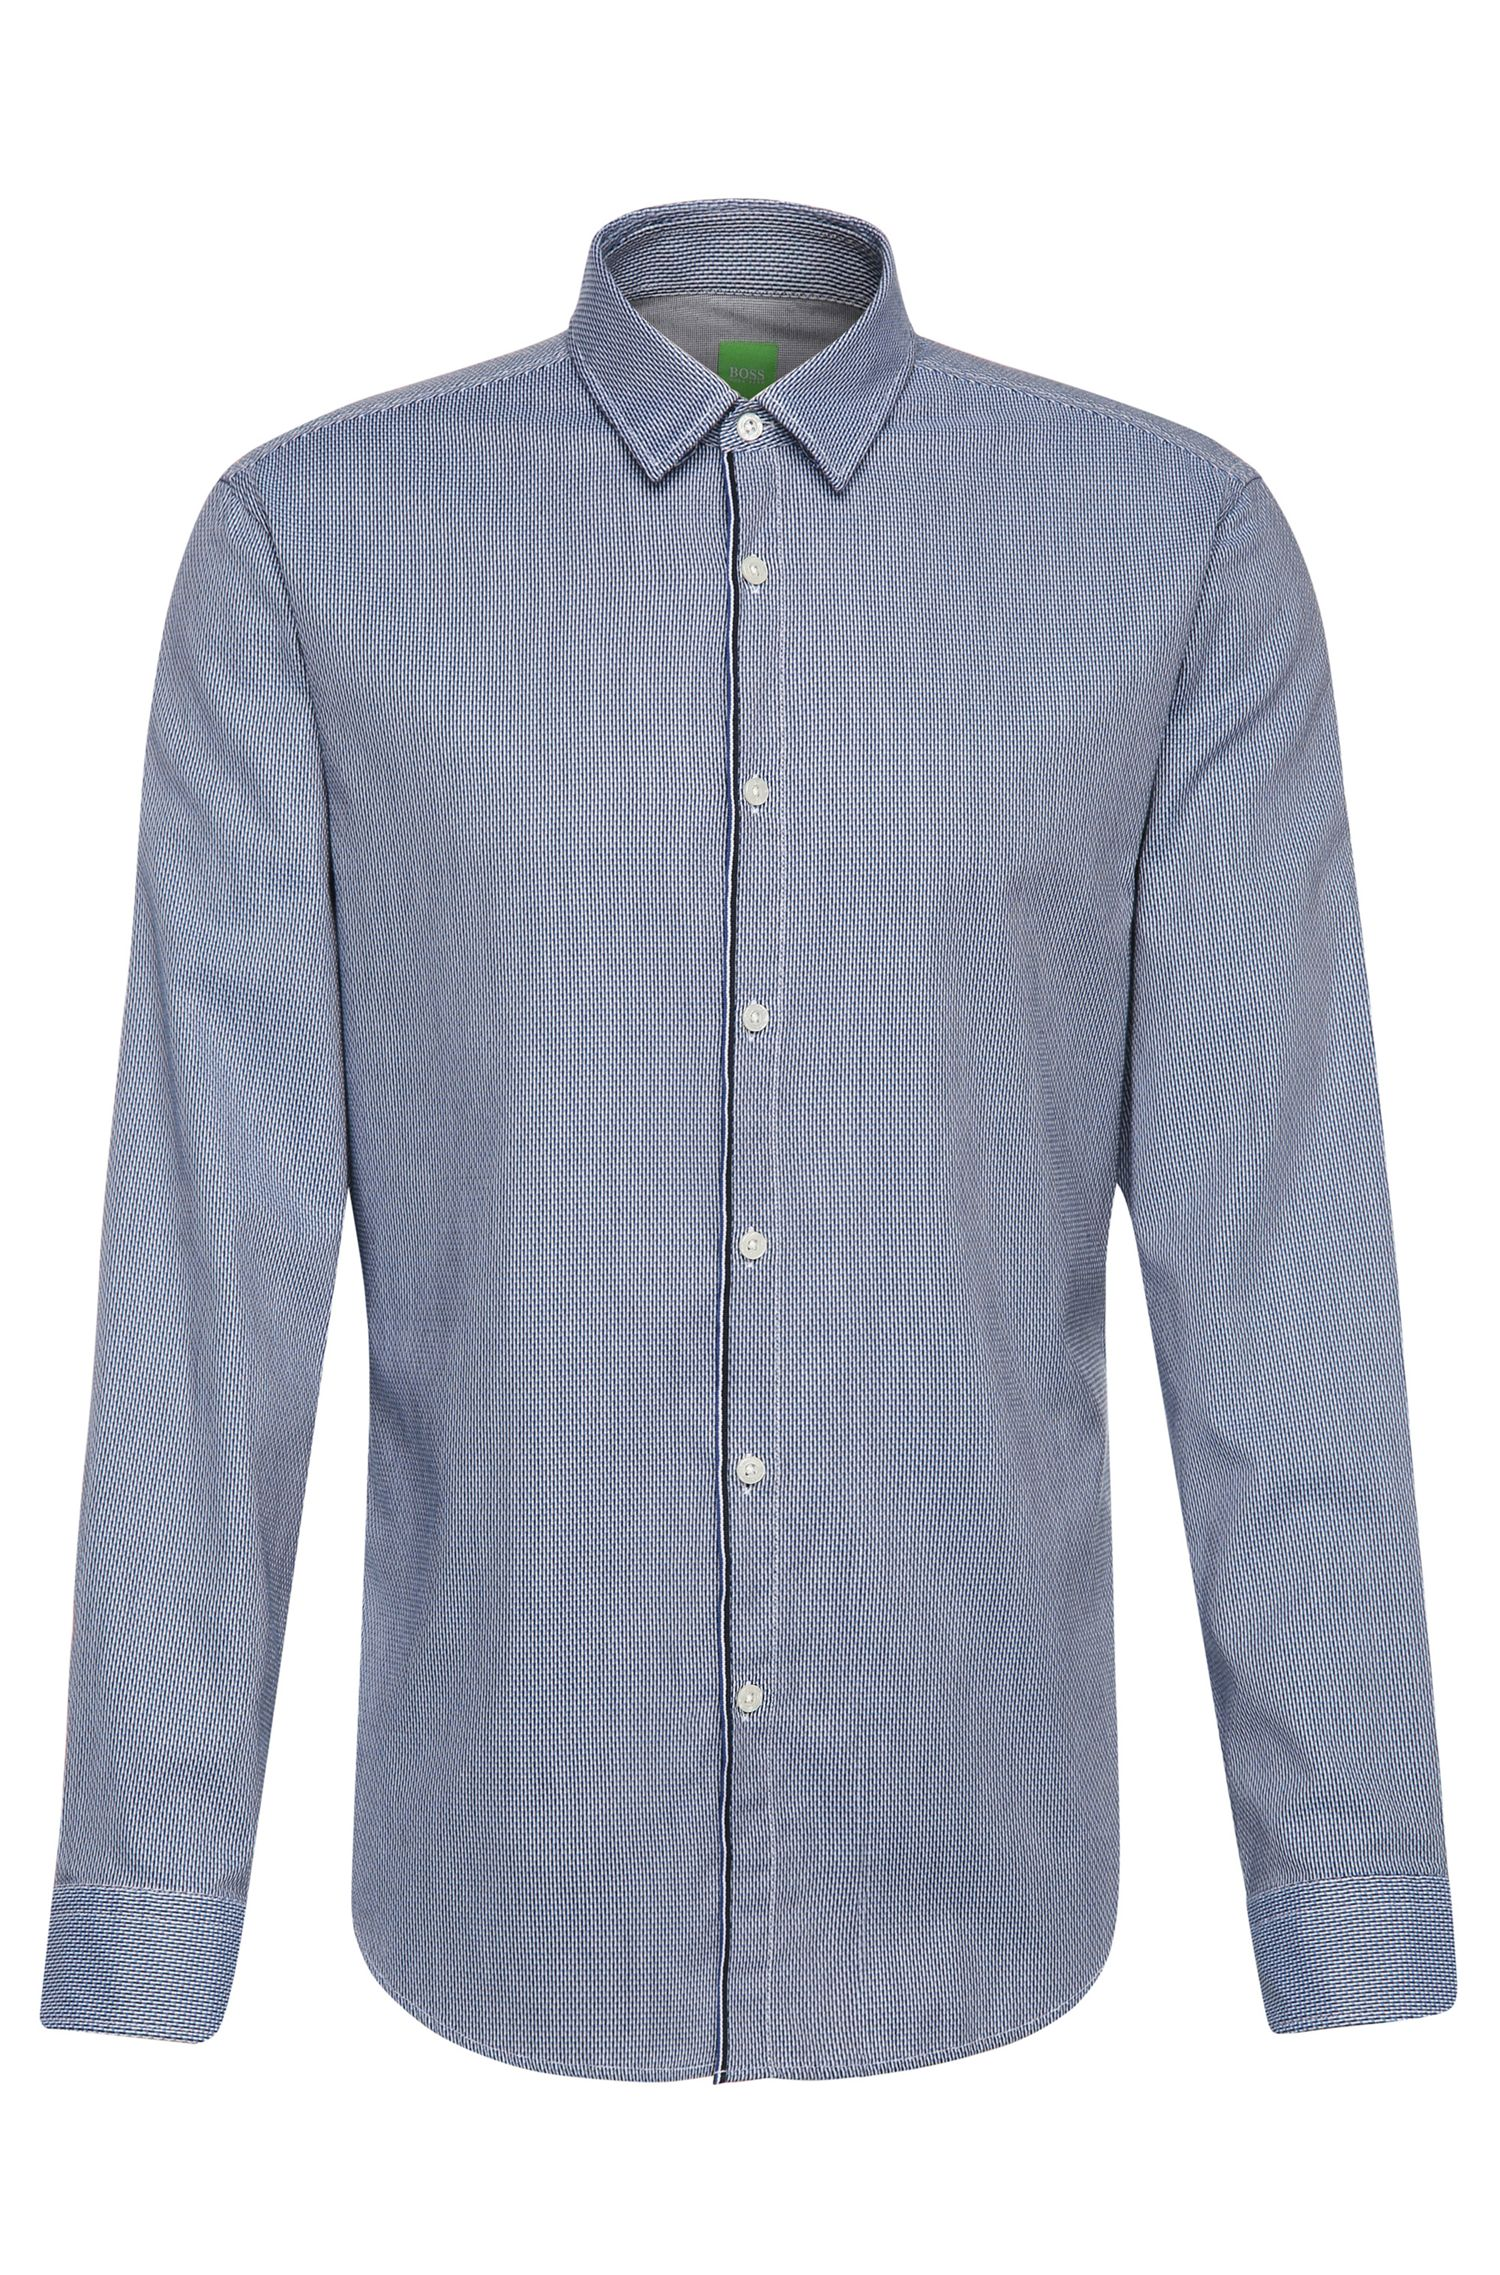 'Brizzi'   Slim Fit, Patterned Cotton Button Down Shirt